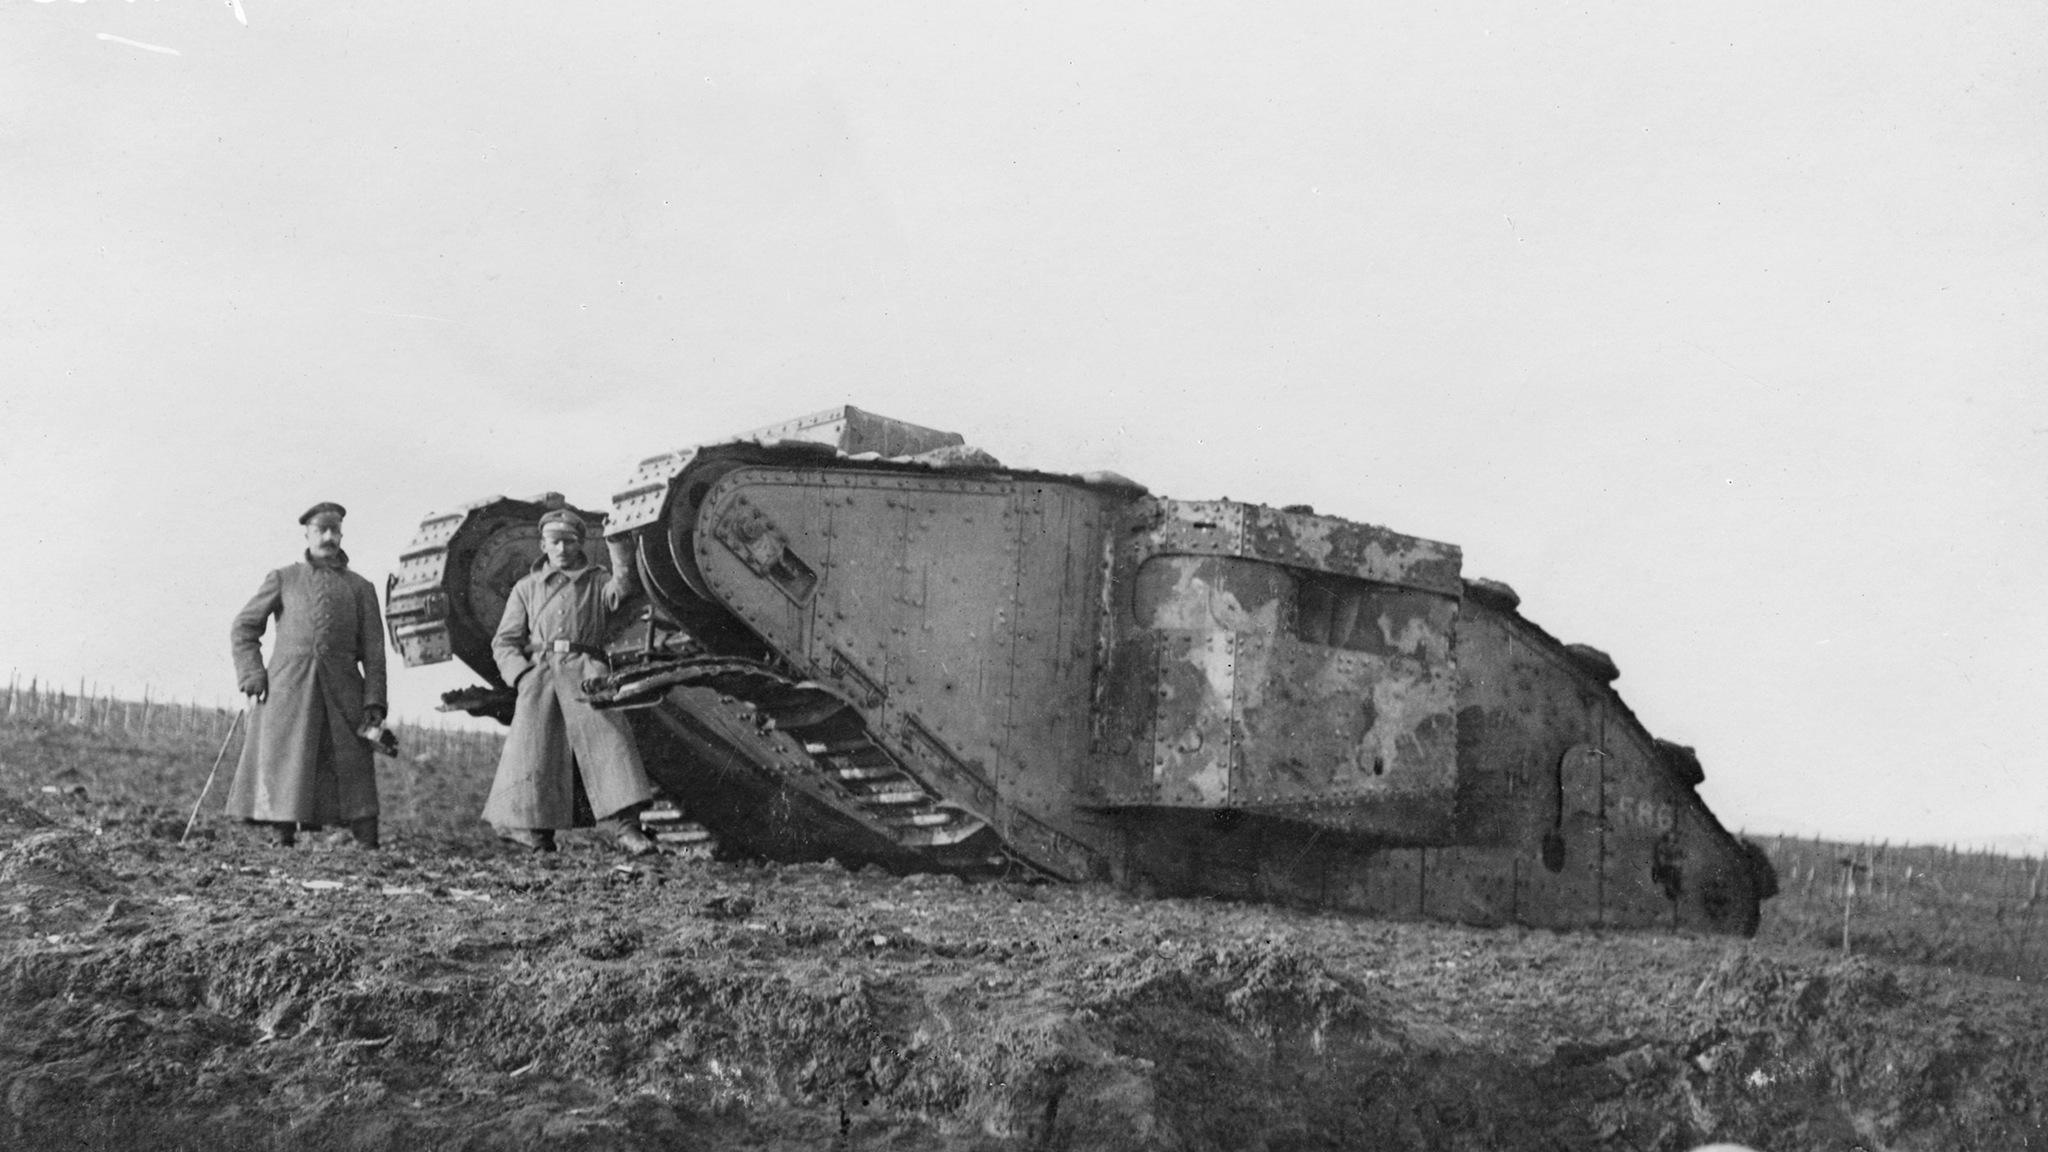 Battle of Bullecourt Arras Campaign